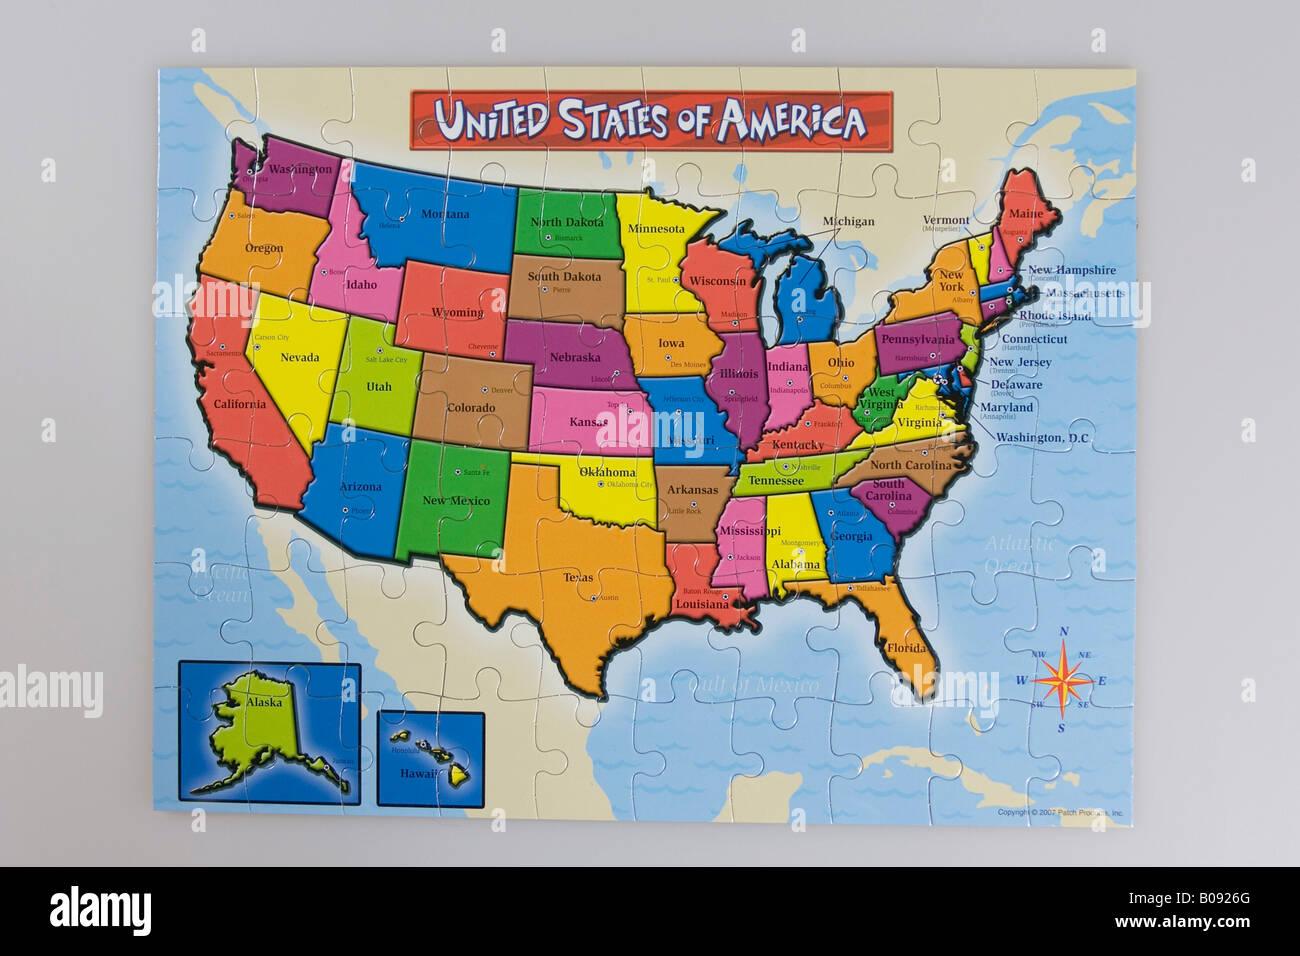 States Map United States Stockfotos & States Map United ...